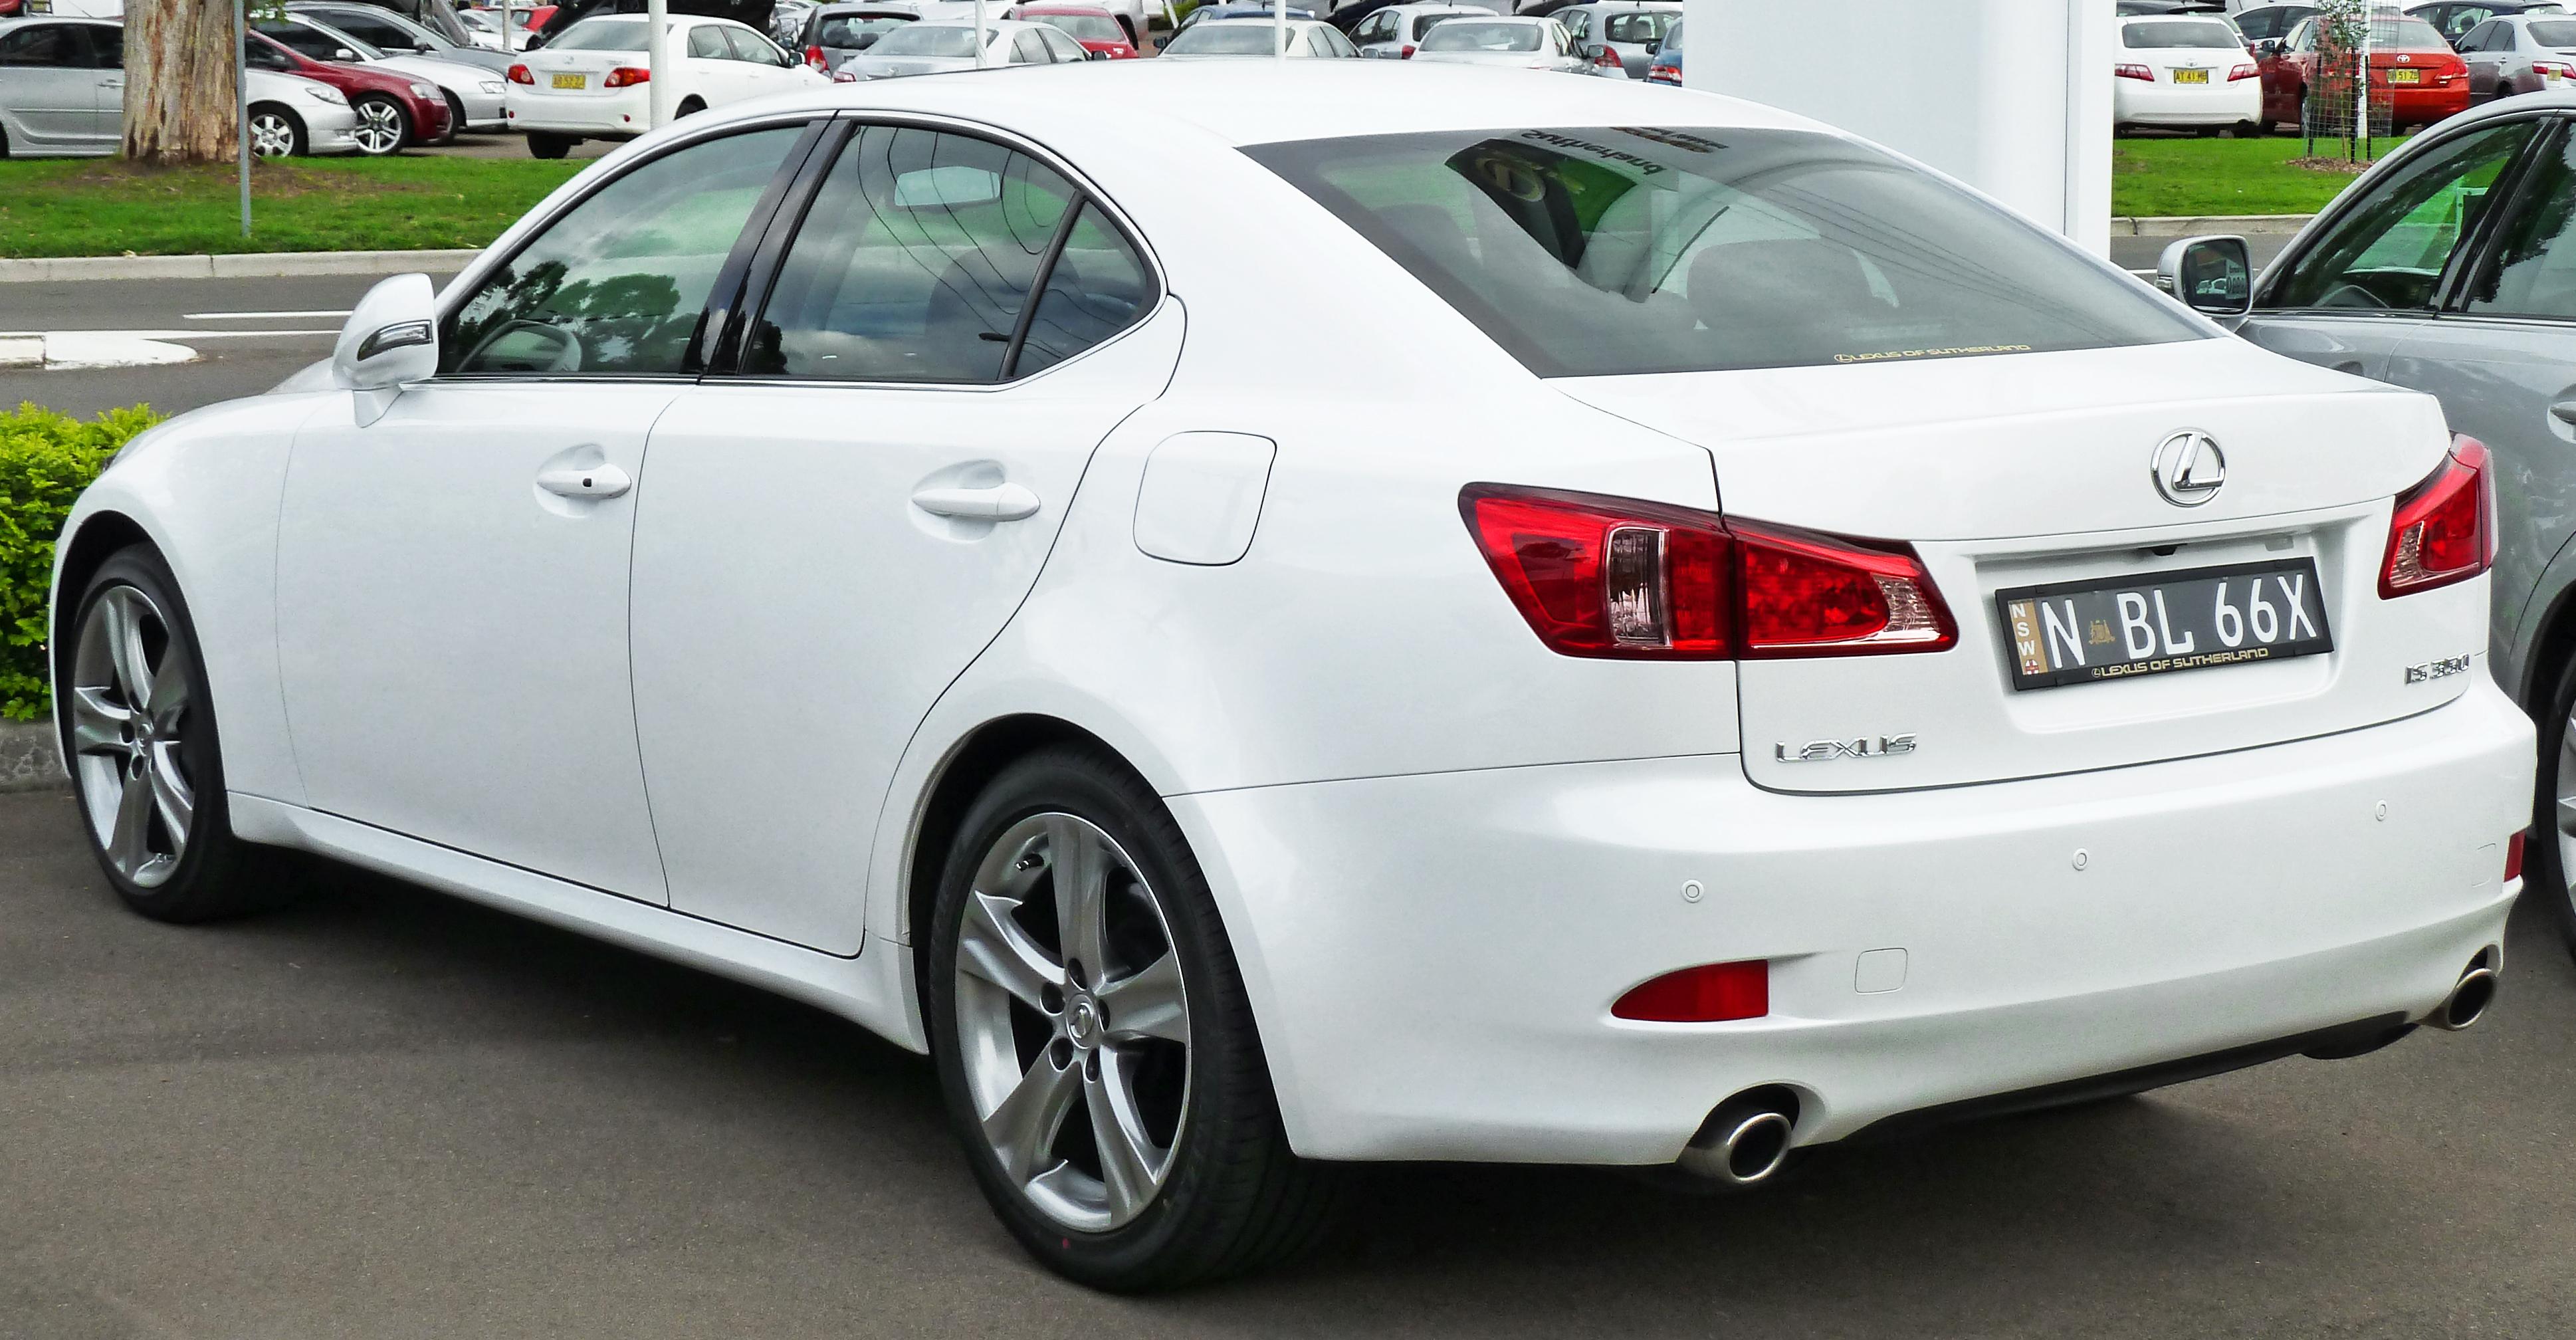 Lexus Vs Mercedes Bmw Audi Insurance Luxury